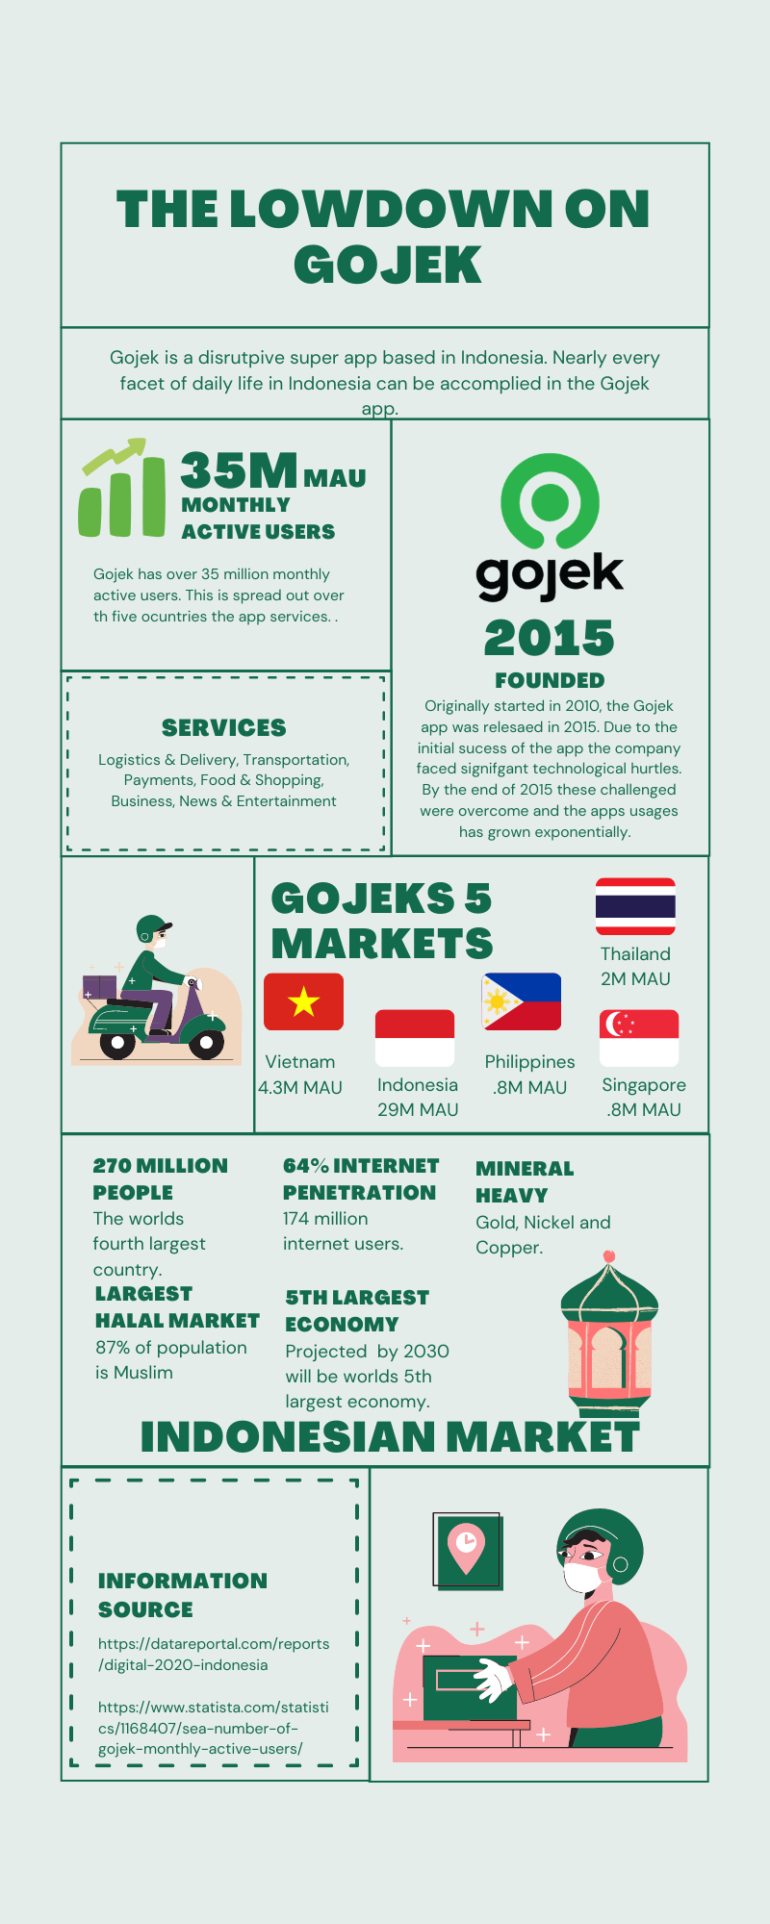 What is Gojek?